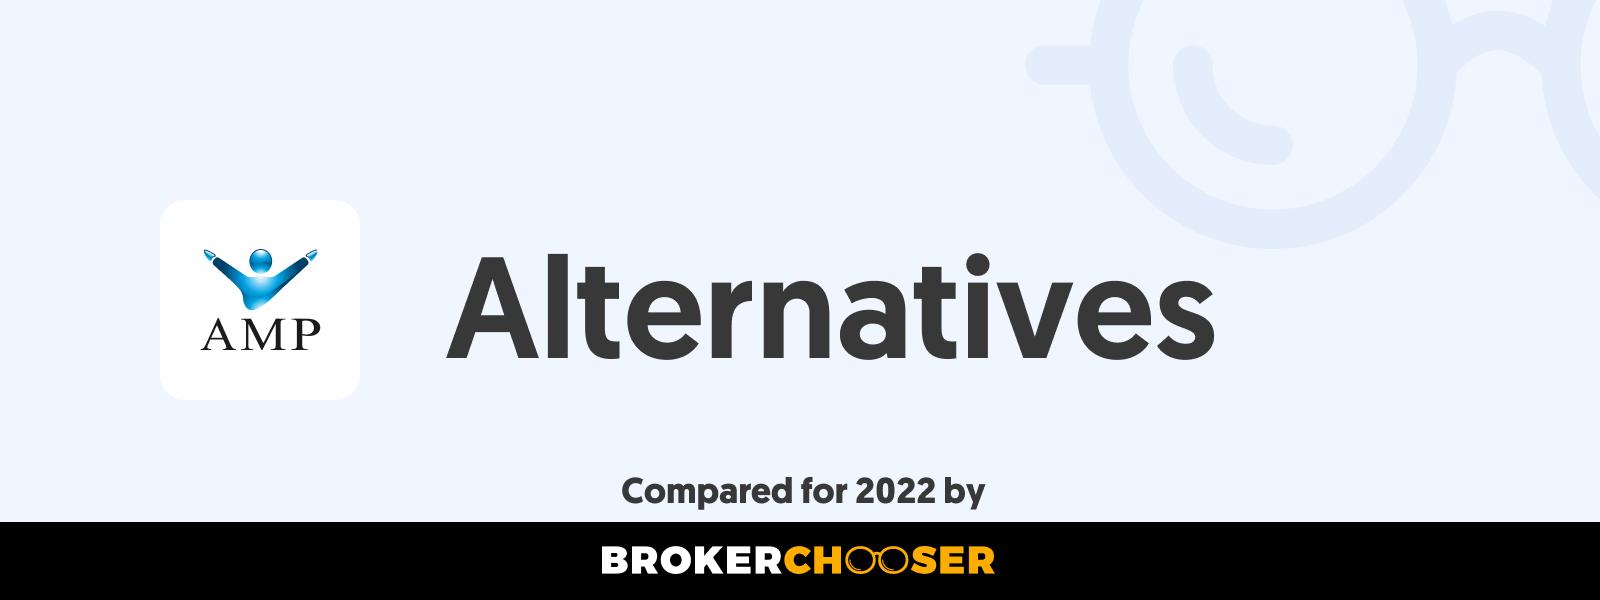 AMP Futures Alternatives